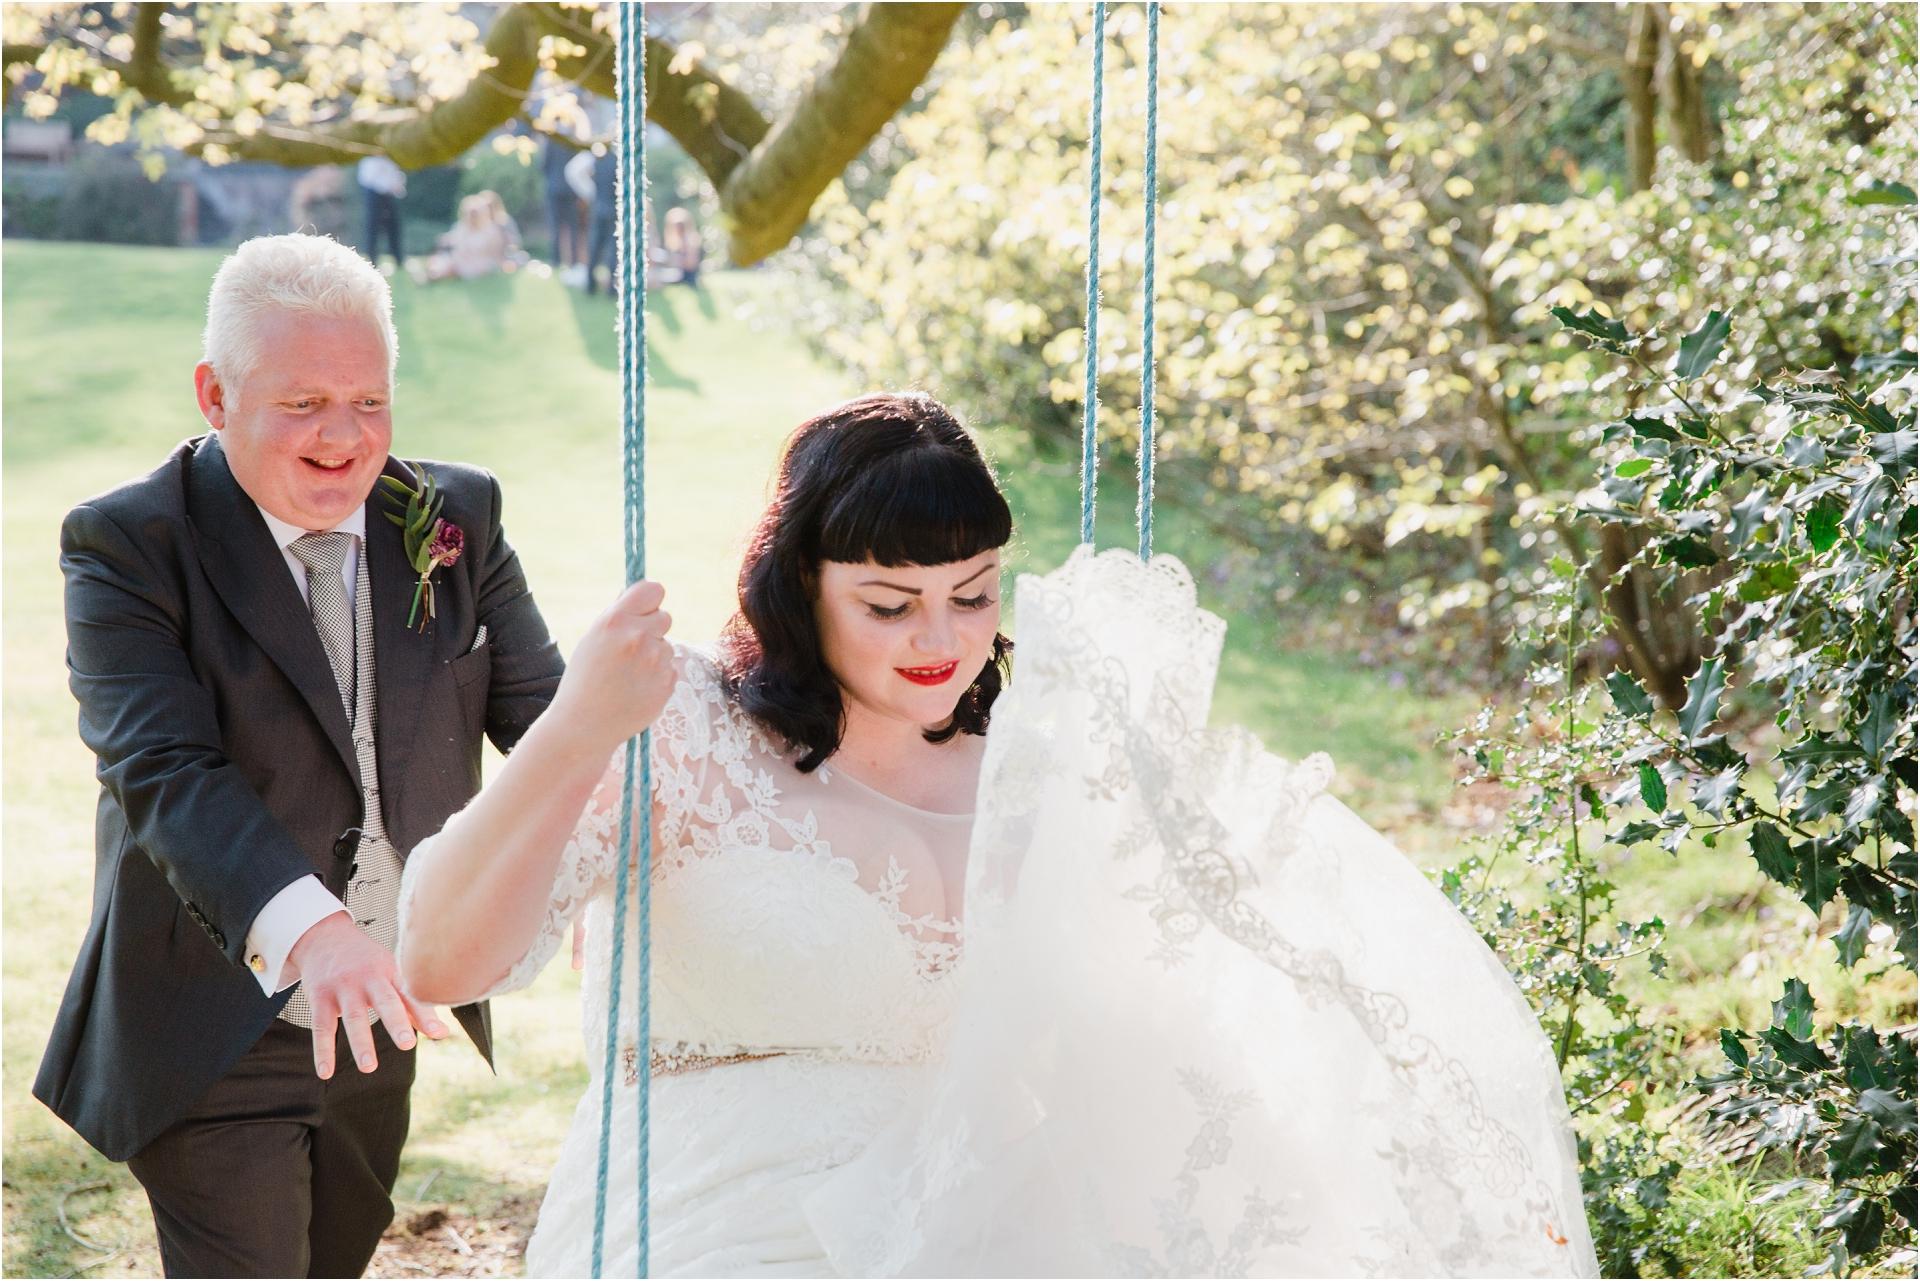 Wedding couple on a swing